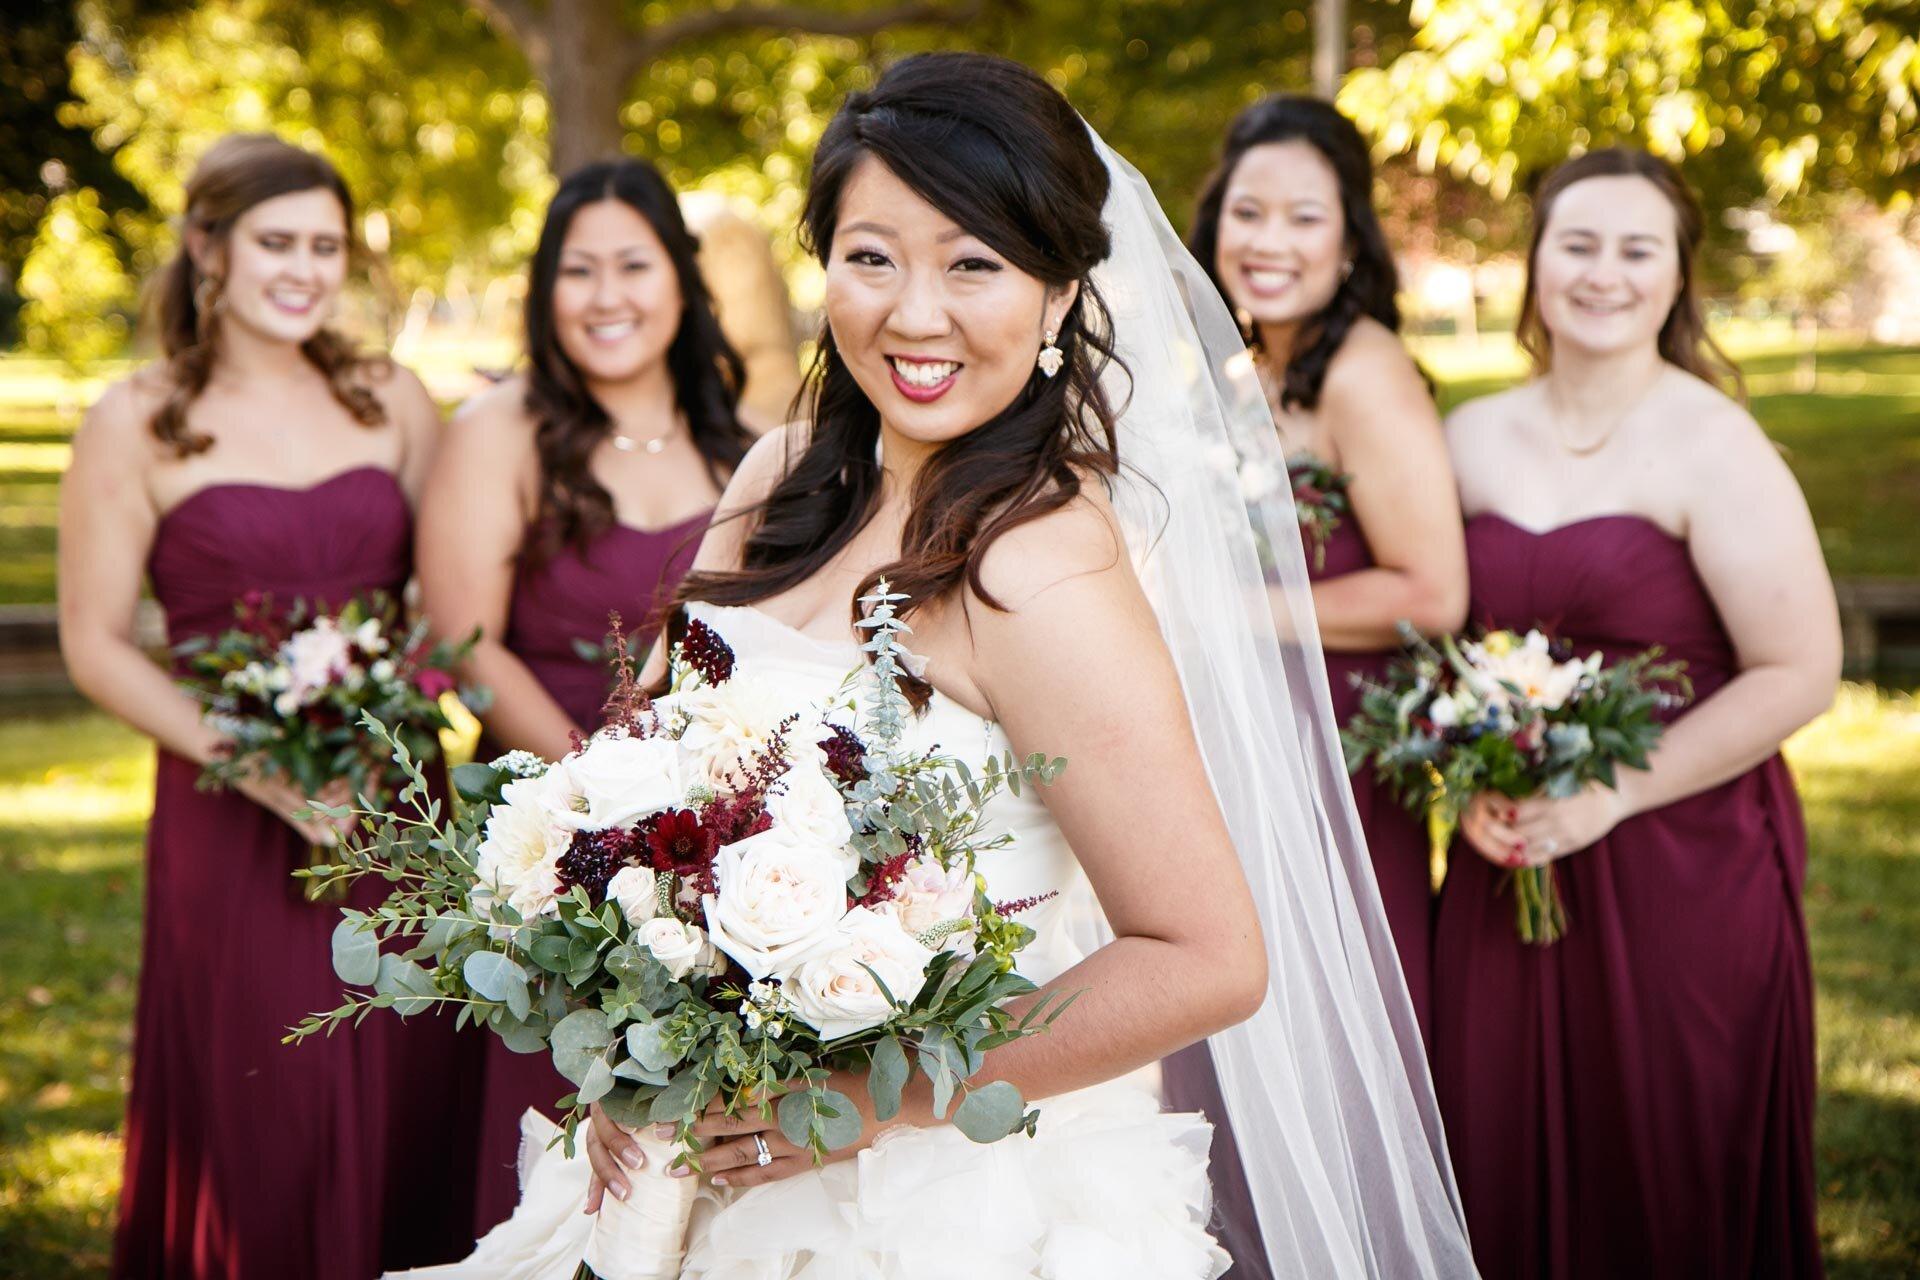 fall-lighting-adam-shea-photography-wedding-engagement-blog-adam-shea-photography-green-bay-appleton-neenah-photographer-15.jpg